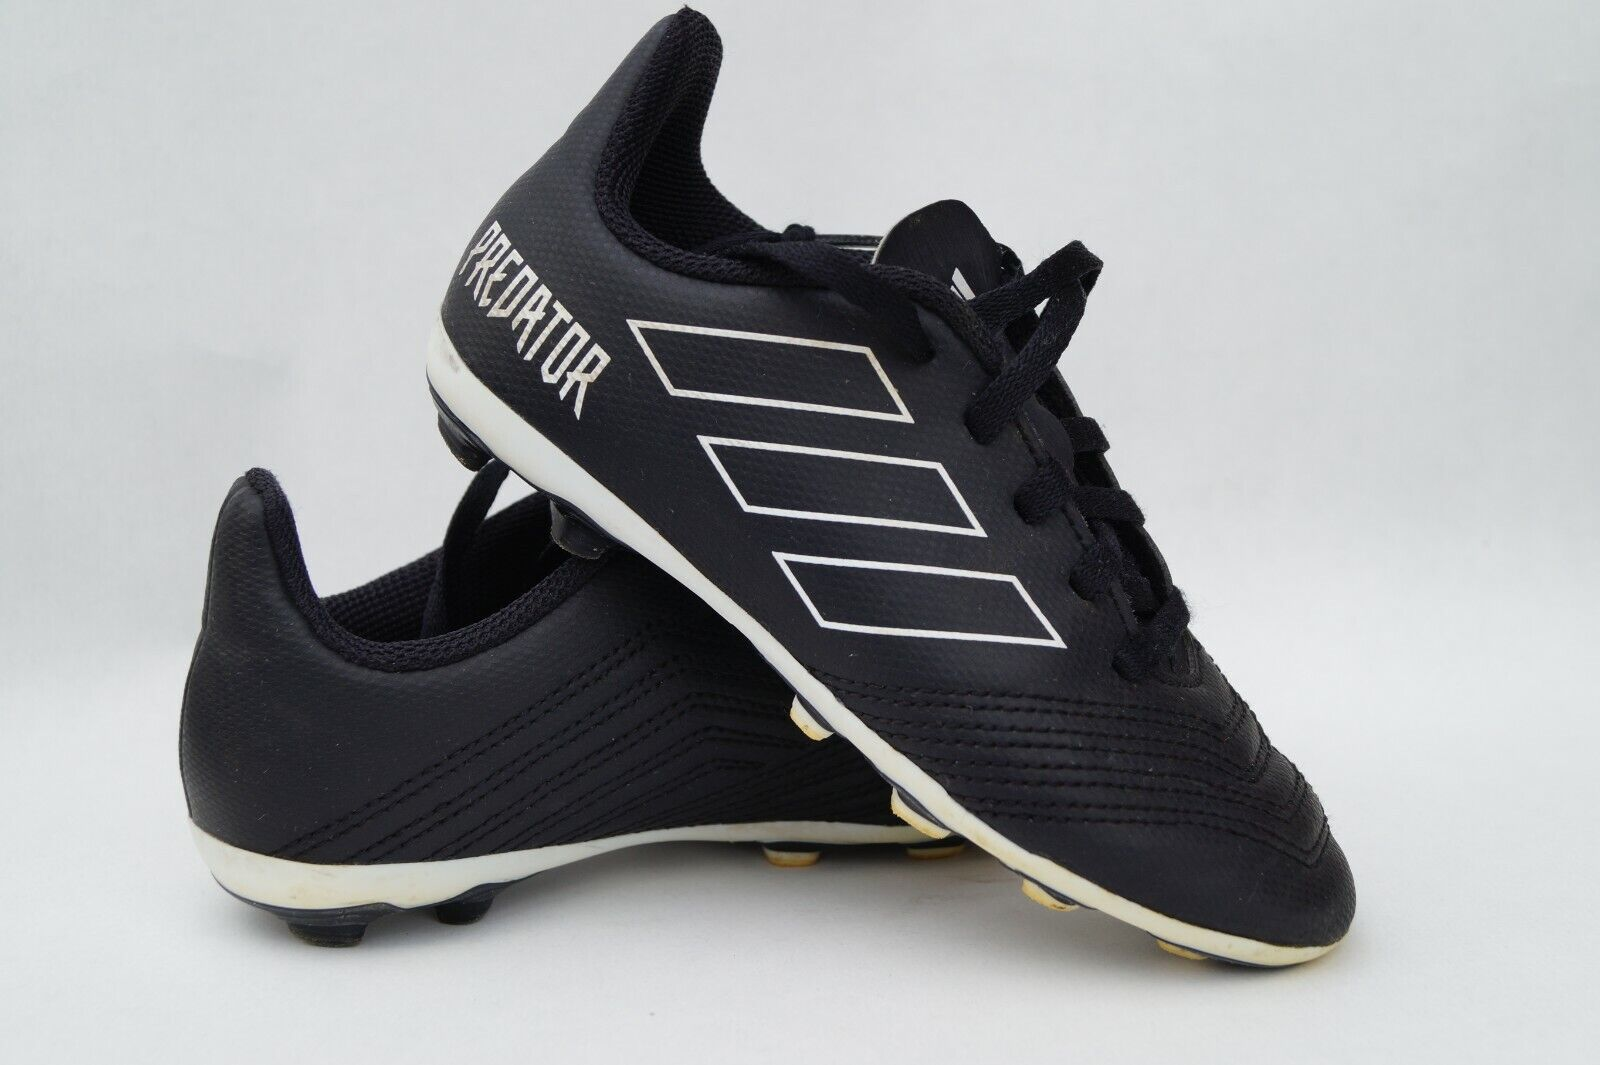 Fußballschuhe Stollenschuhe Adidas Gr.30 Kinder Jungen Super Zustand